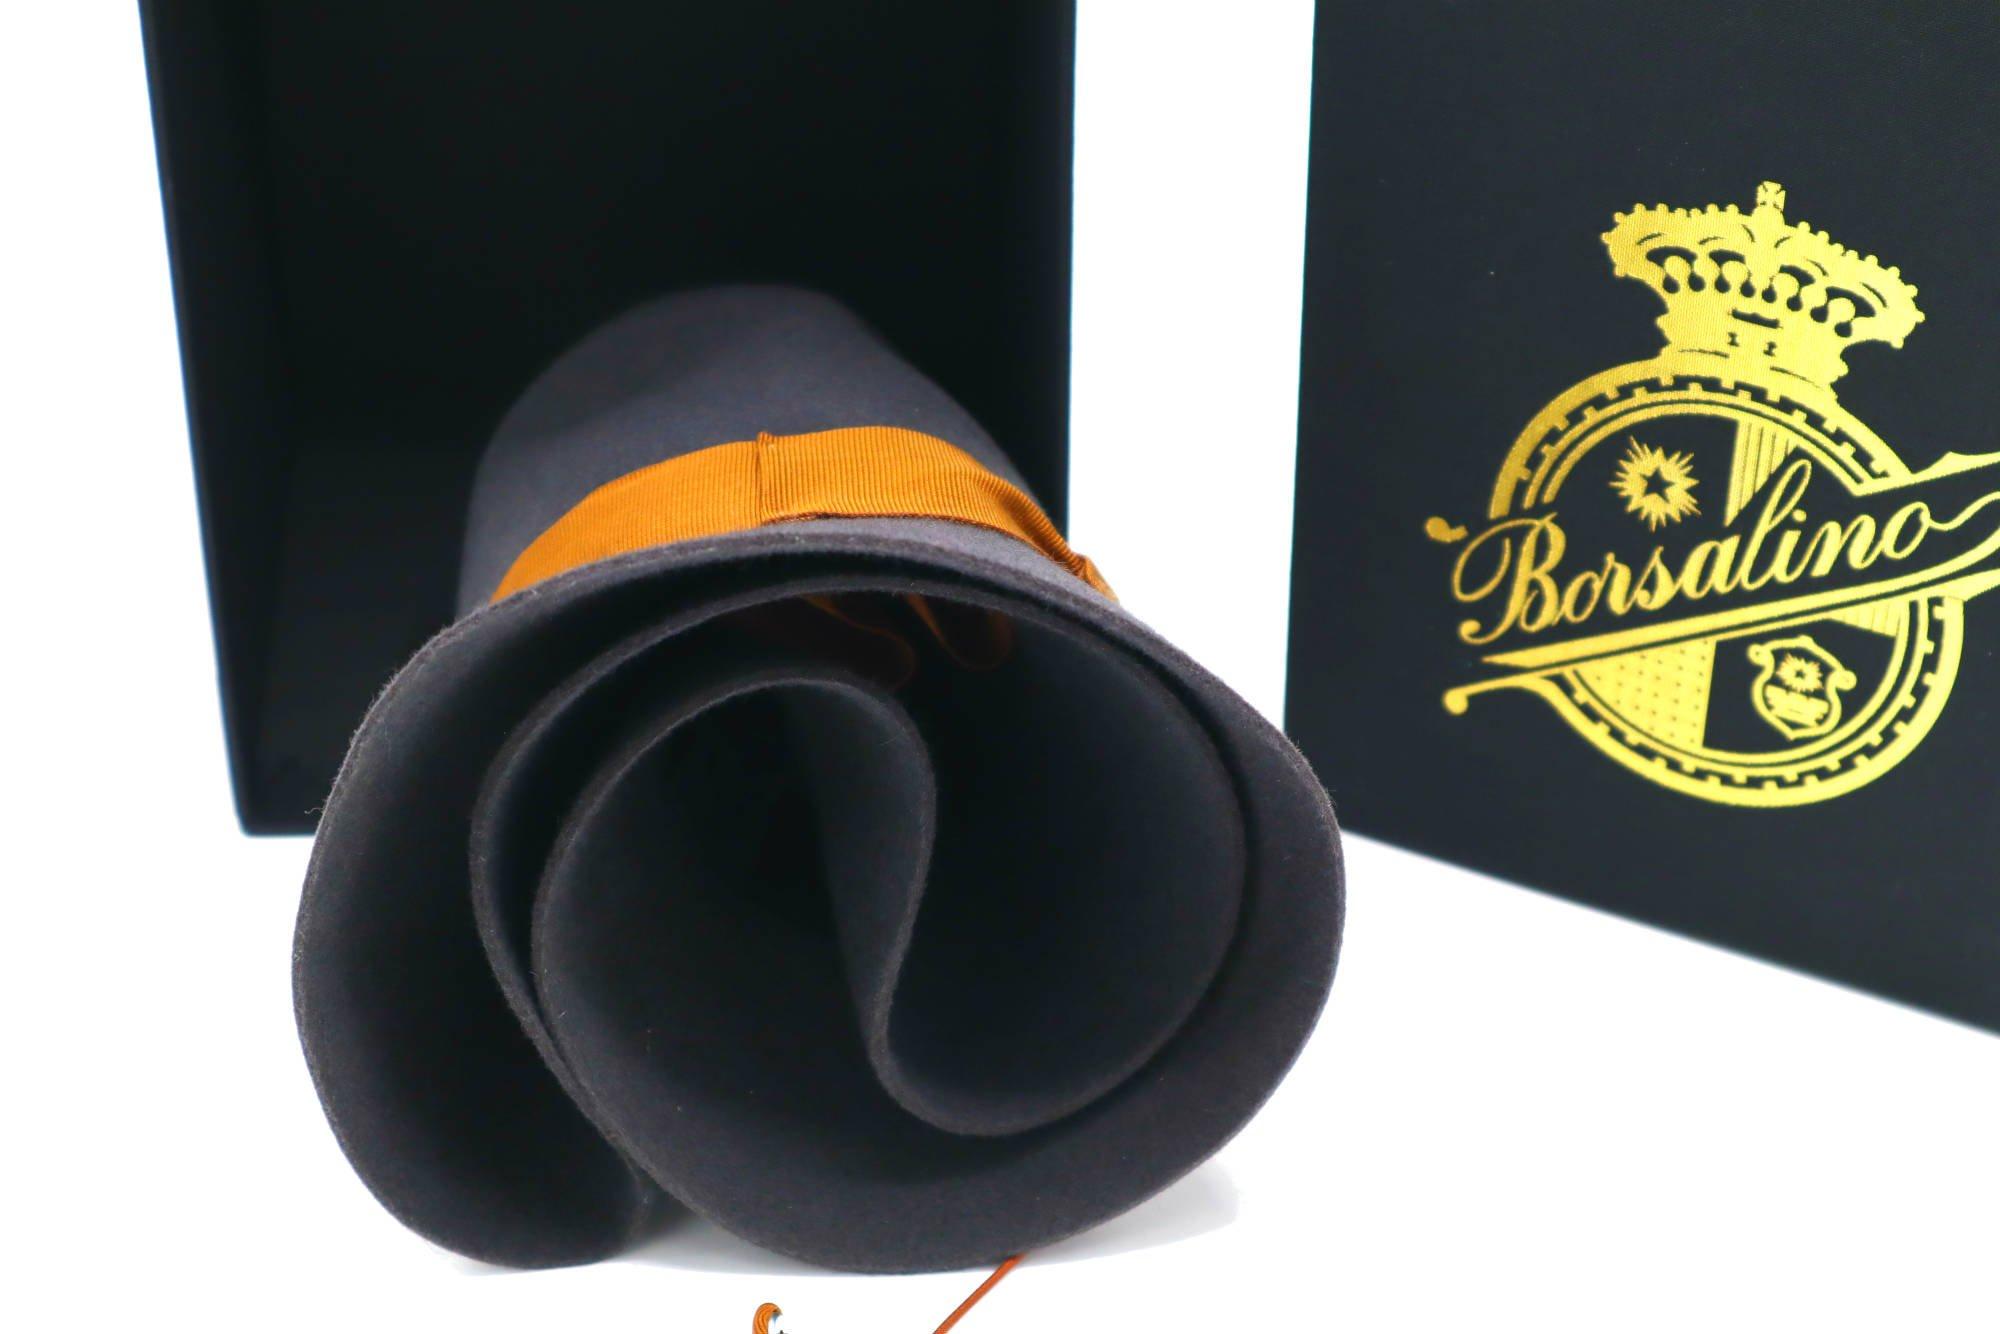 opvouwbare Borsalino hoed topshot close up